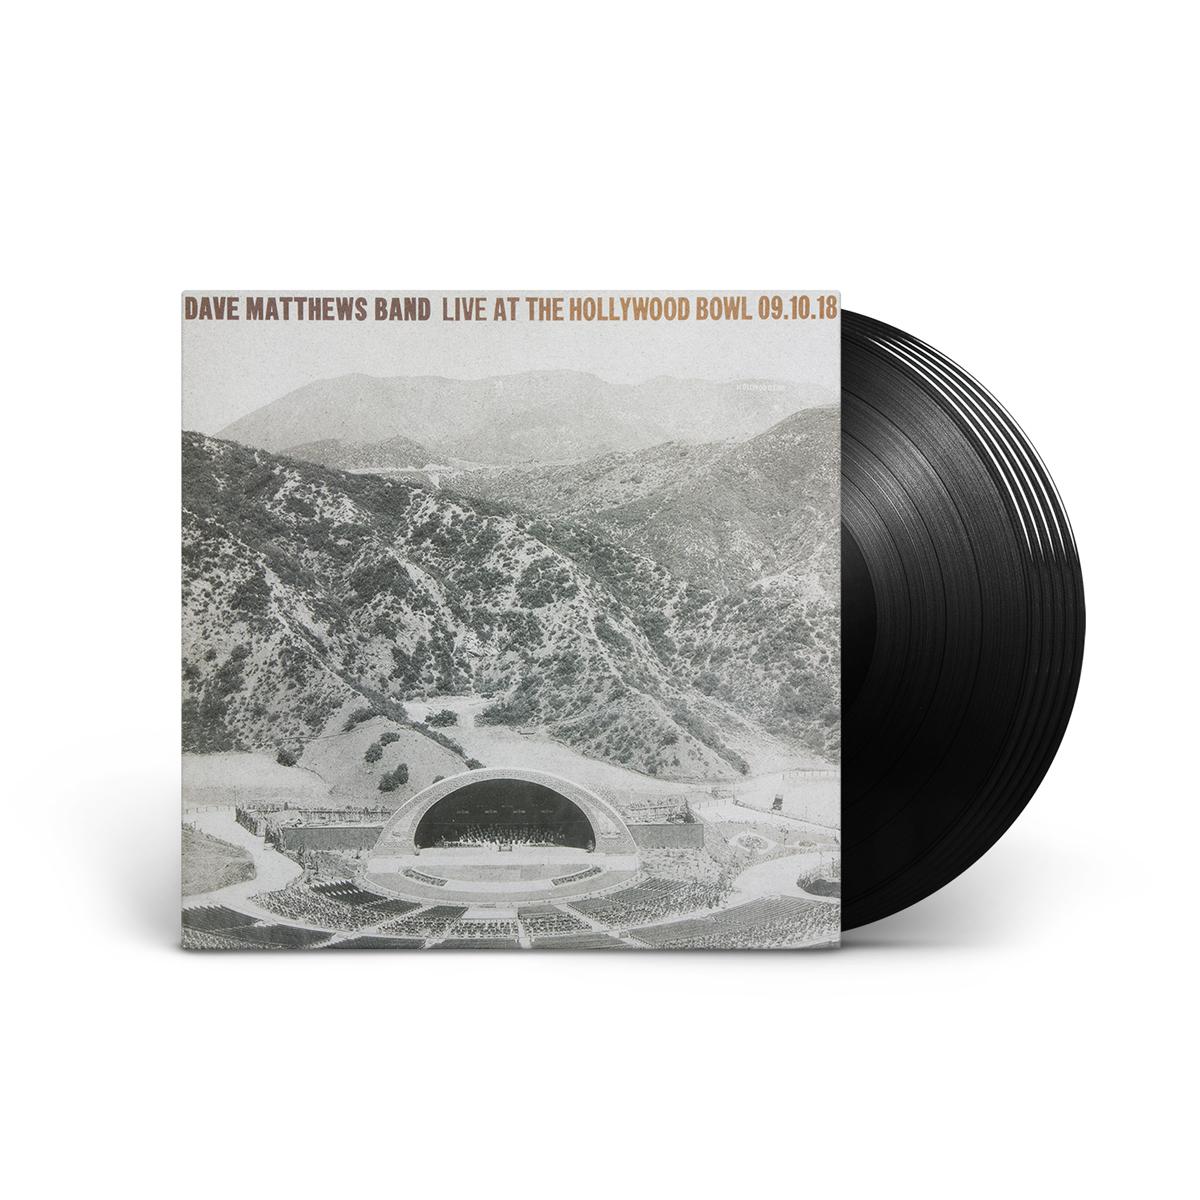 Live At The Hollywood Bowl 5-LP Vinyl